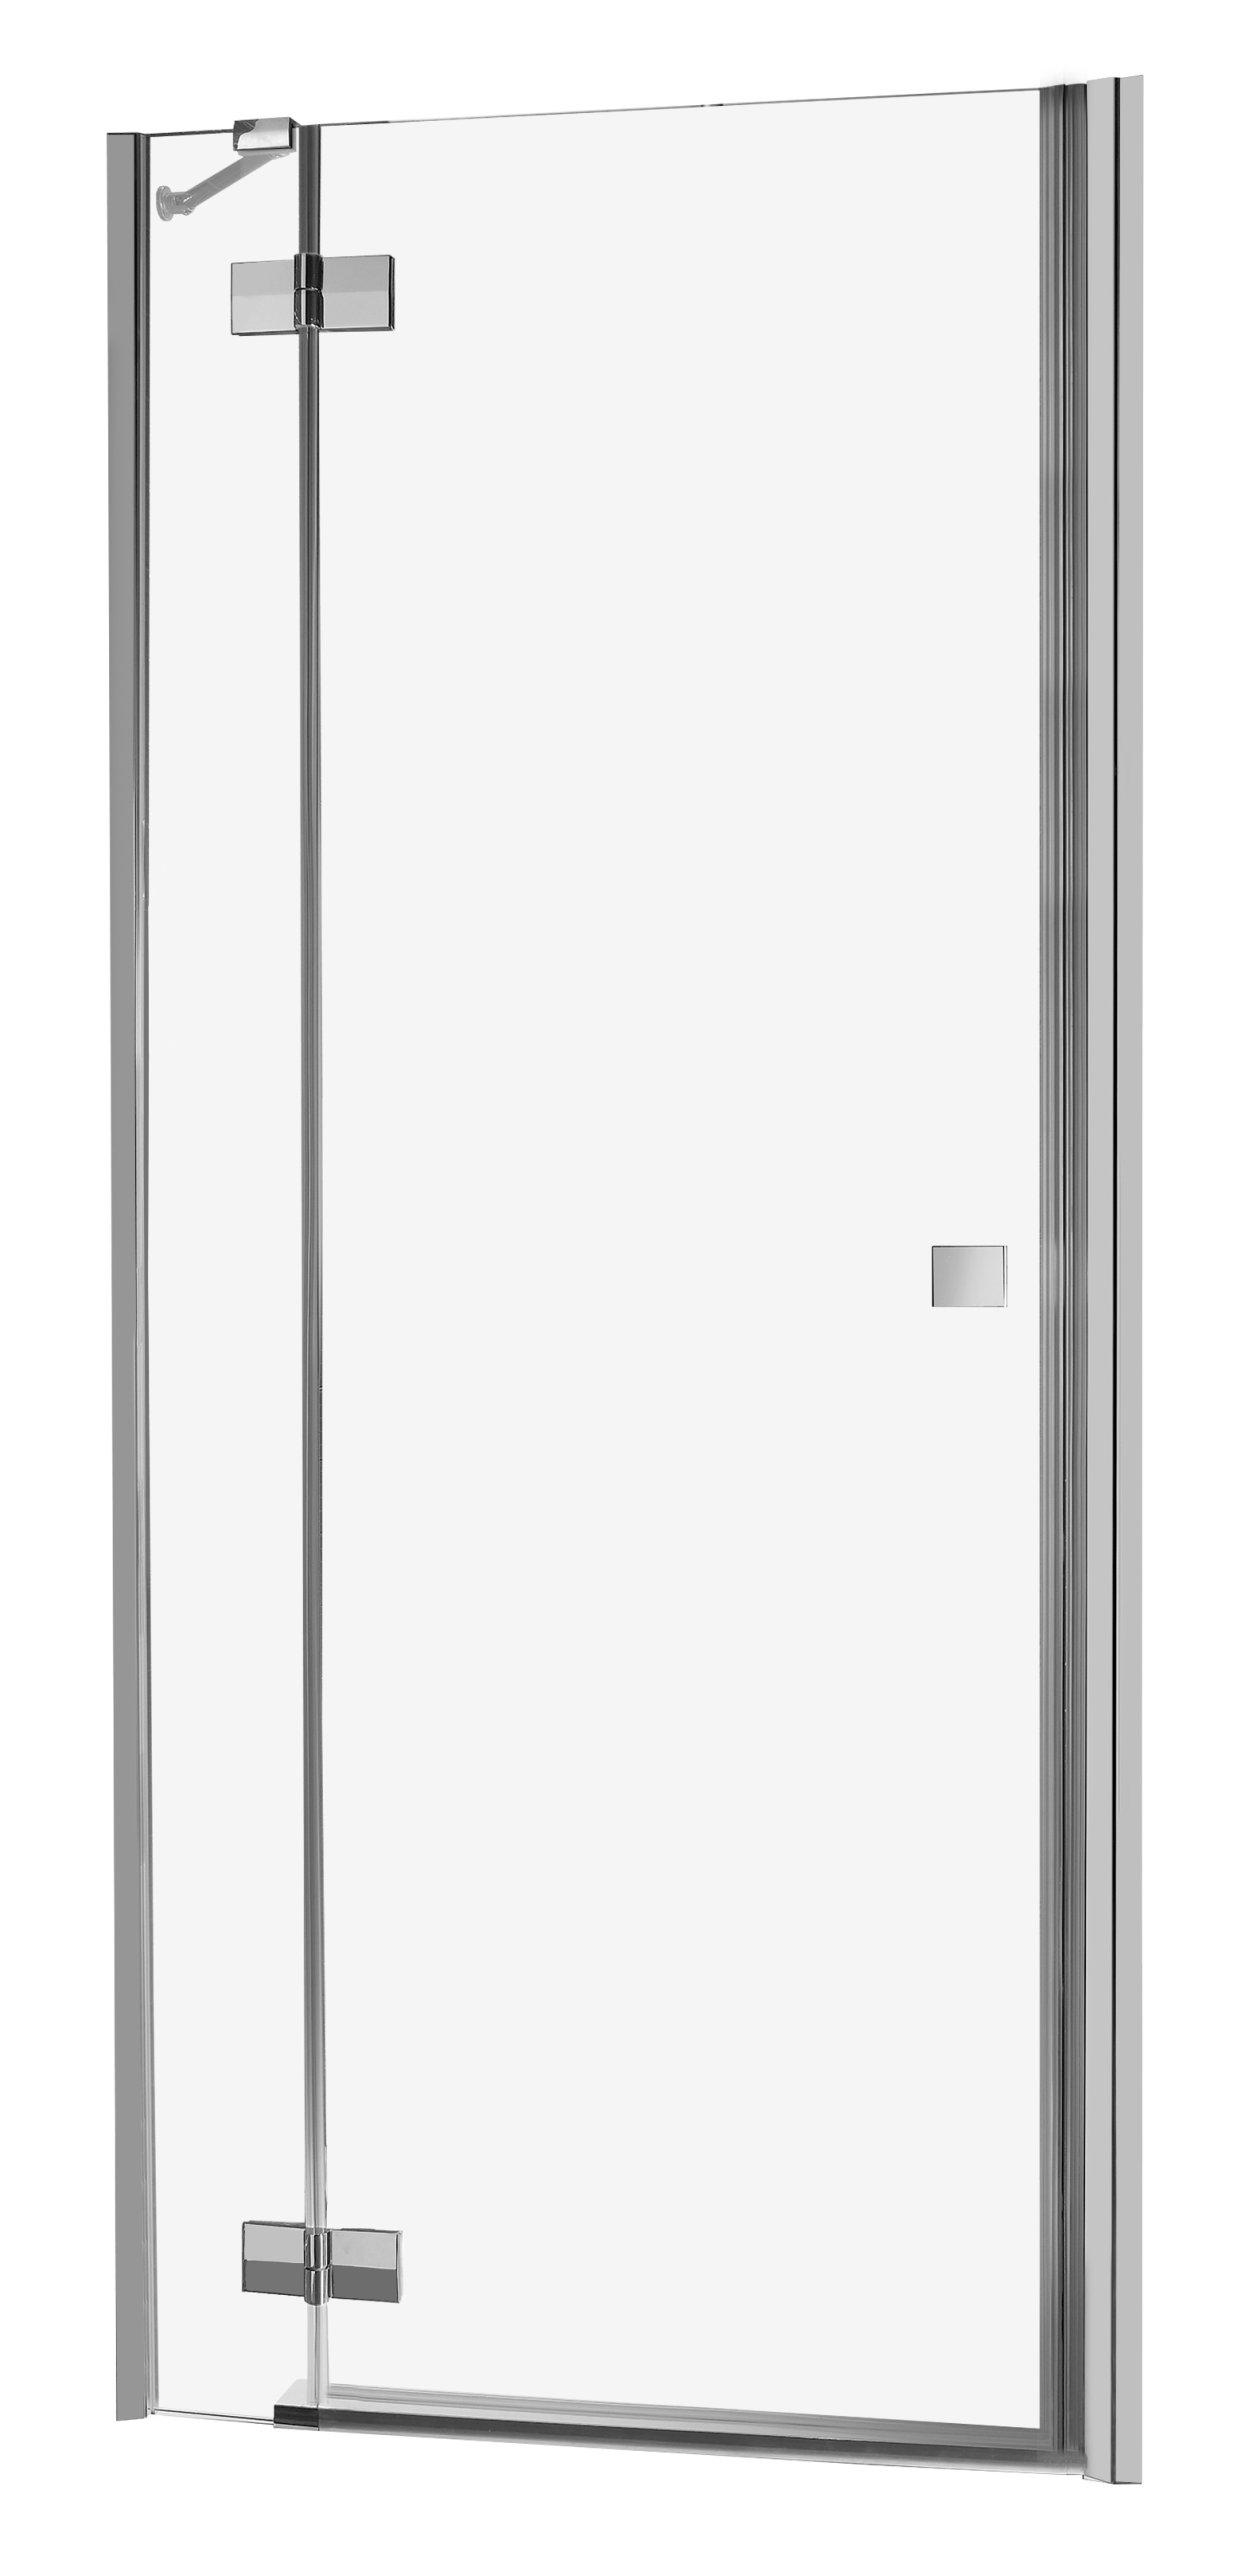 RADAWAY Almatea DWJ 90x195 sprchové dvere